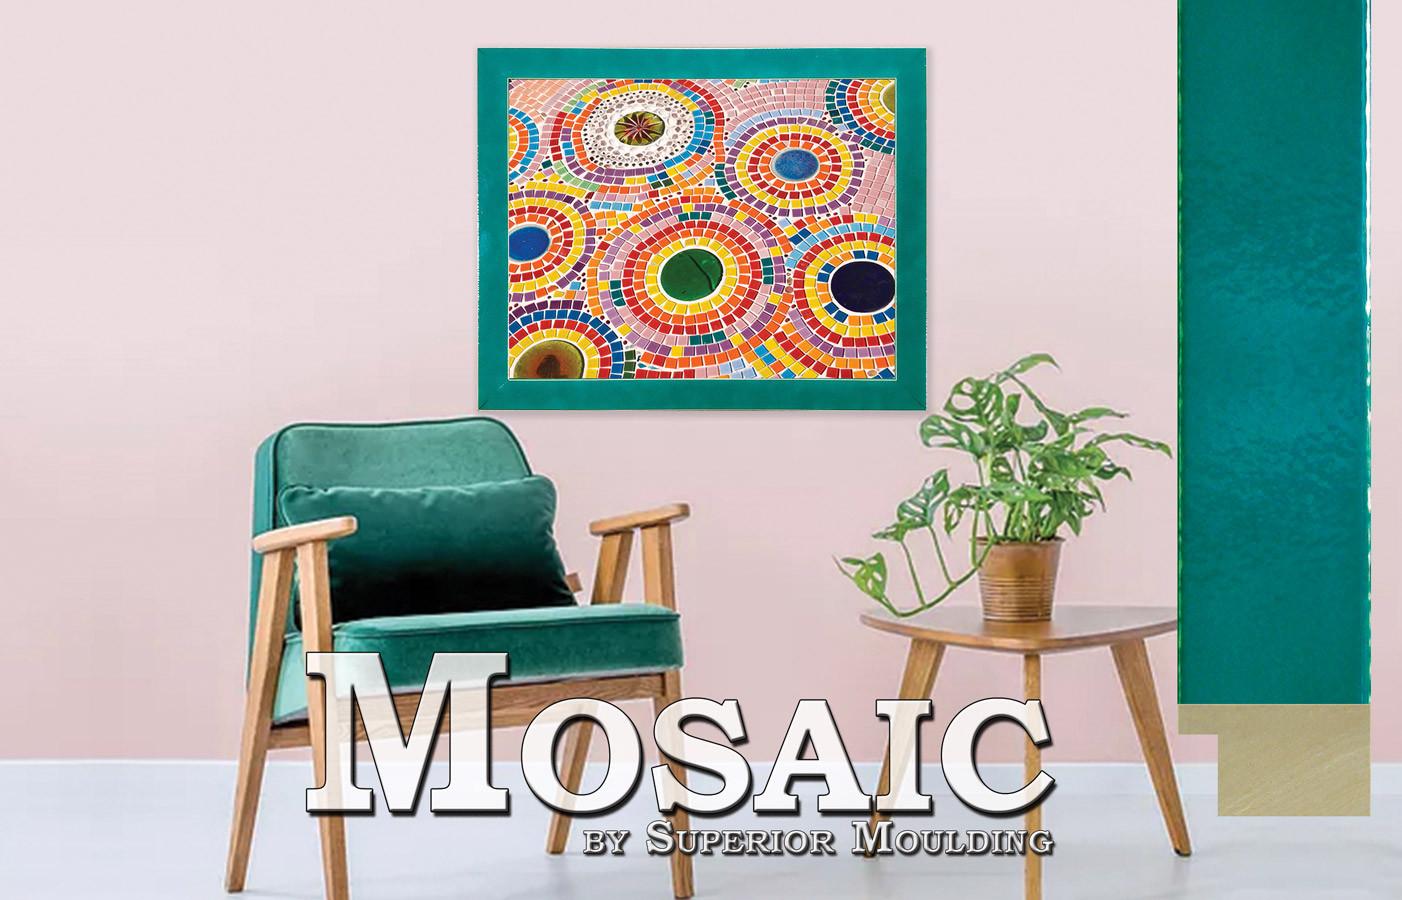 Mosaic Moulding